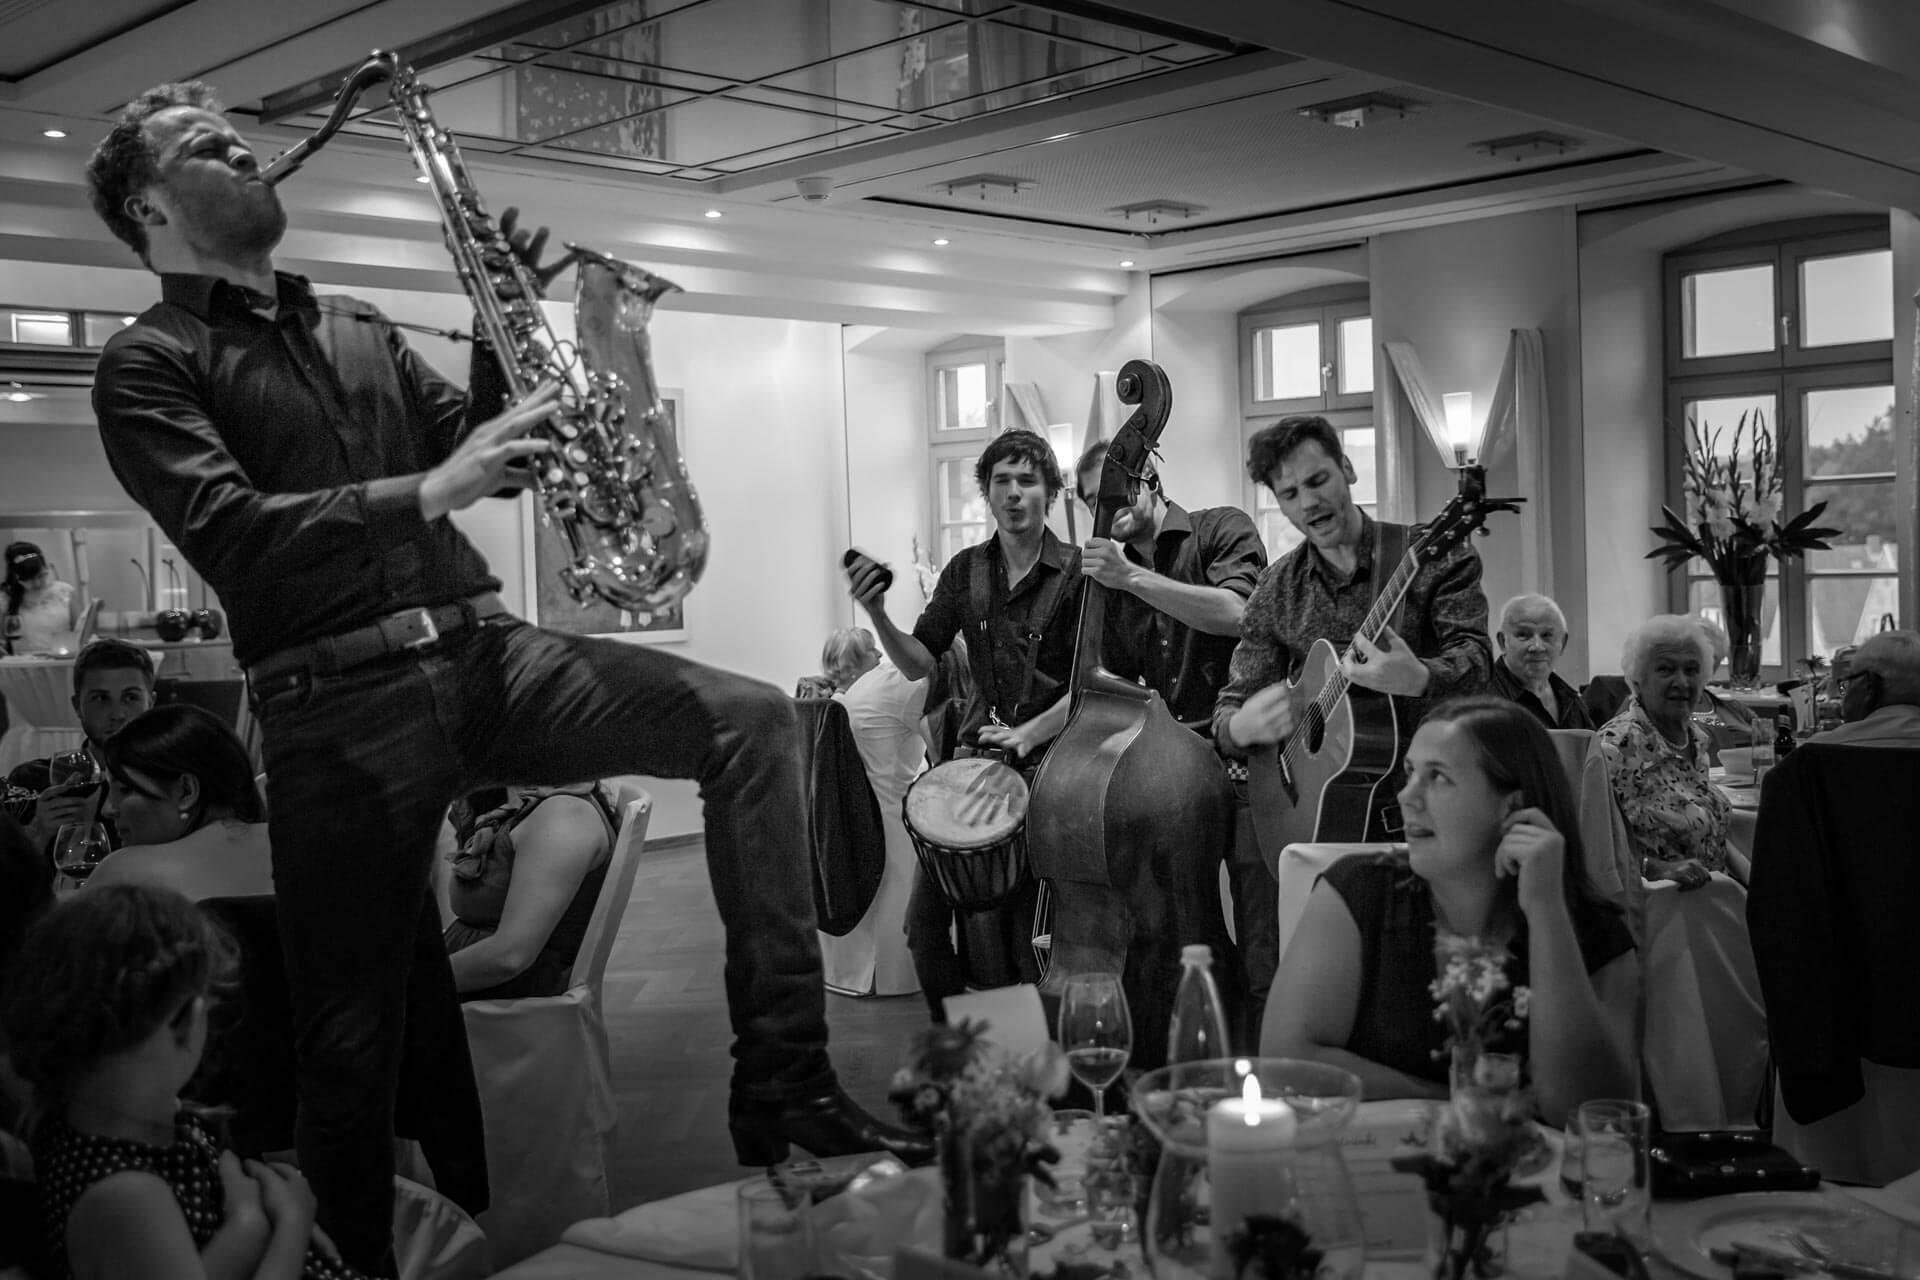 hochzeitsreportage, band, party